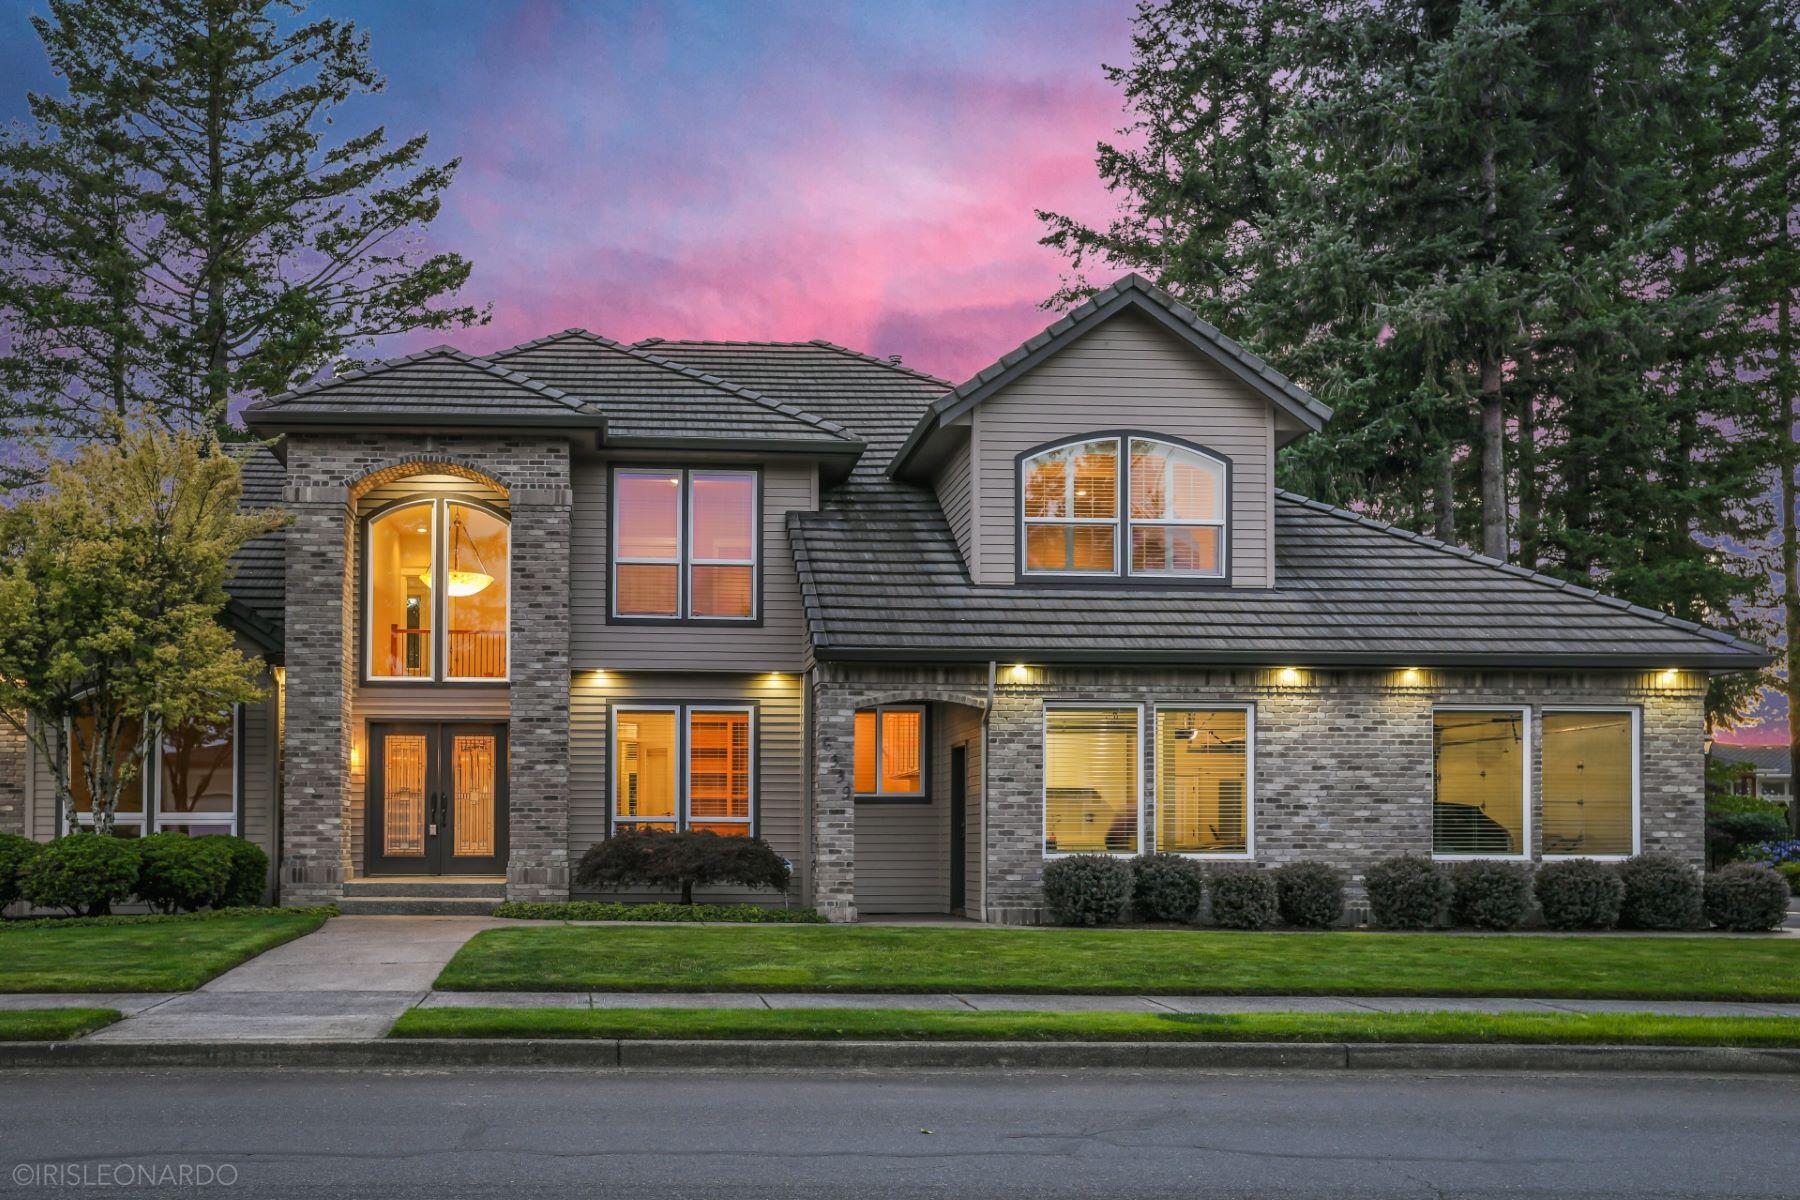 Single Family Homes for Sale at 6339 NW Michaelbrook Lane Camas, Washington 98607 United States